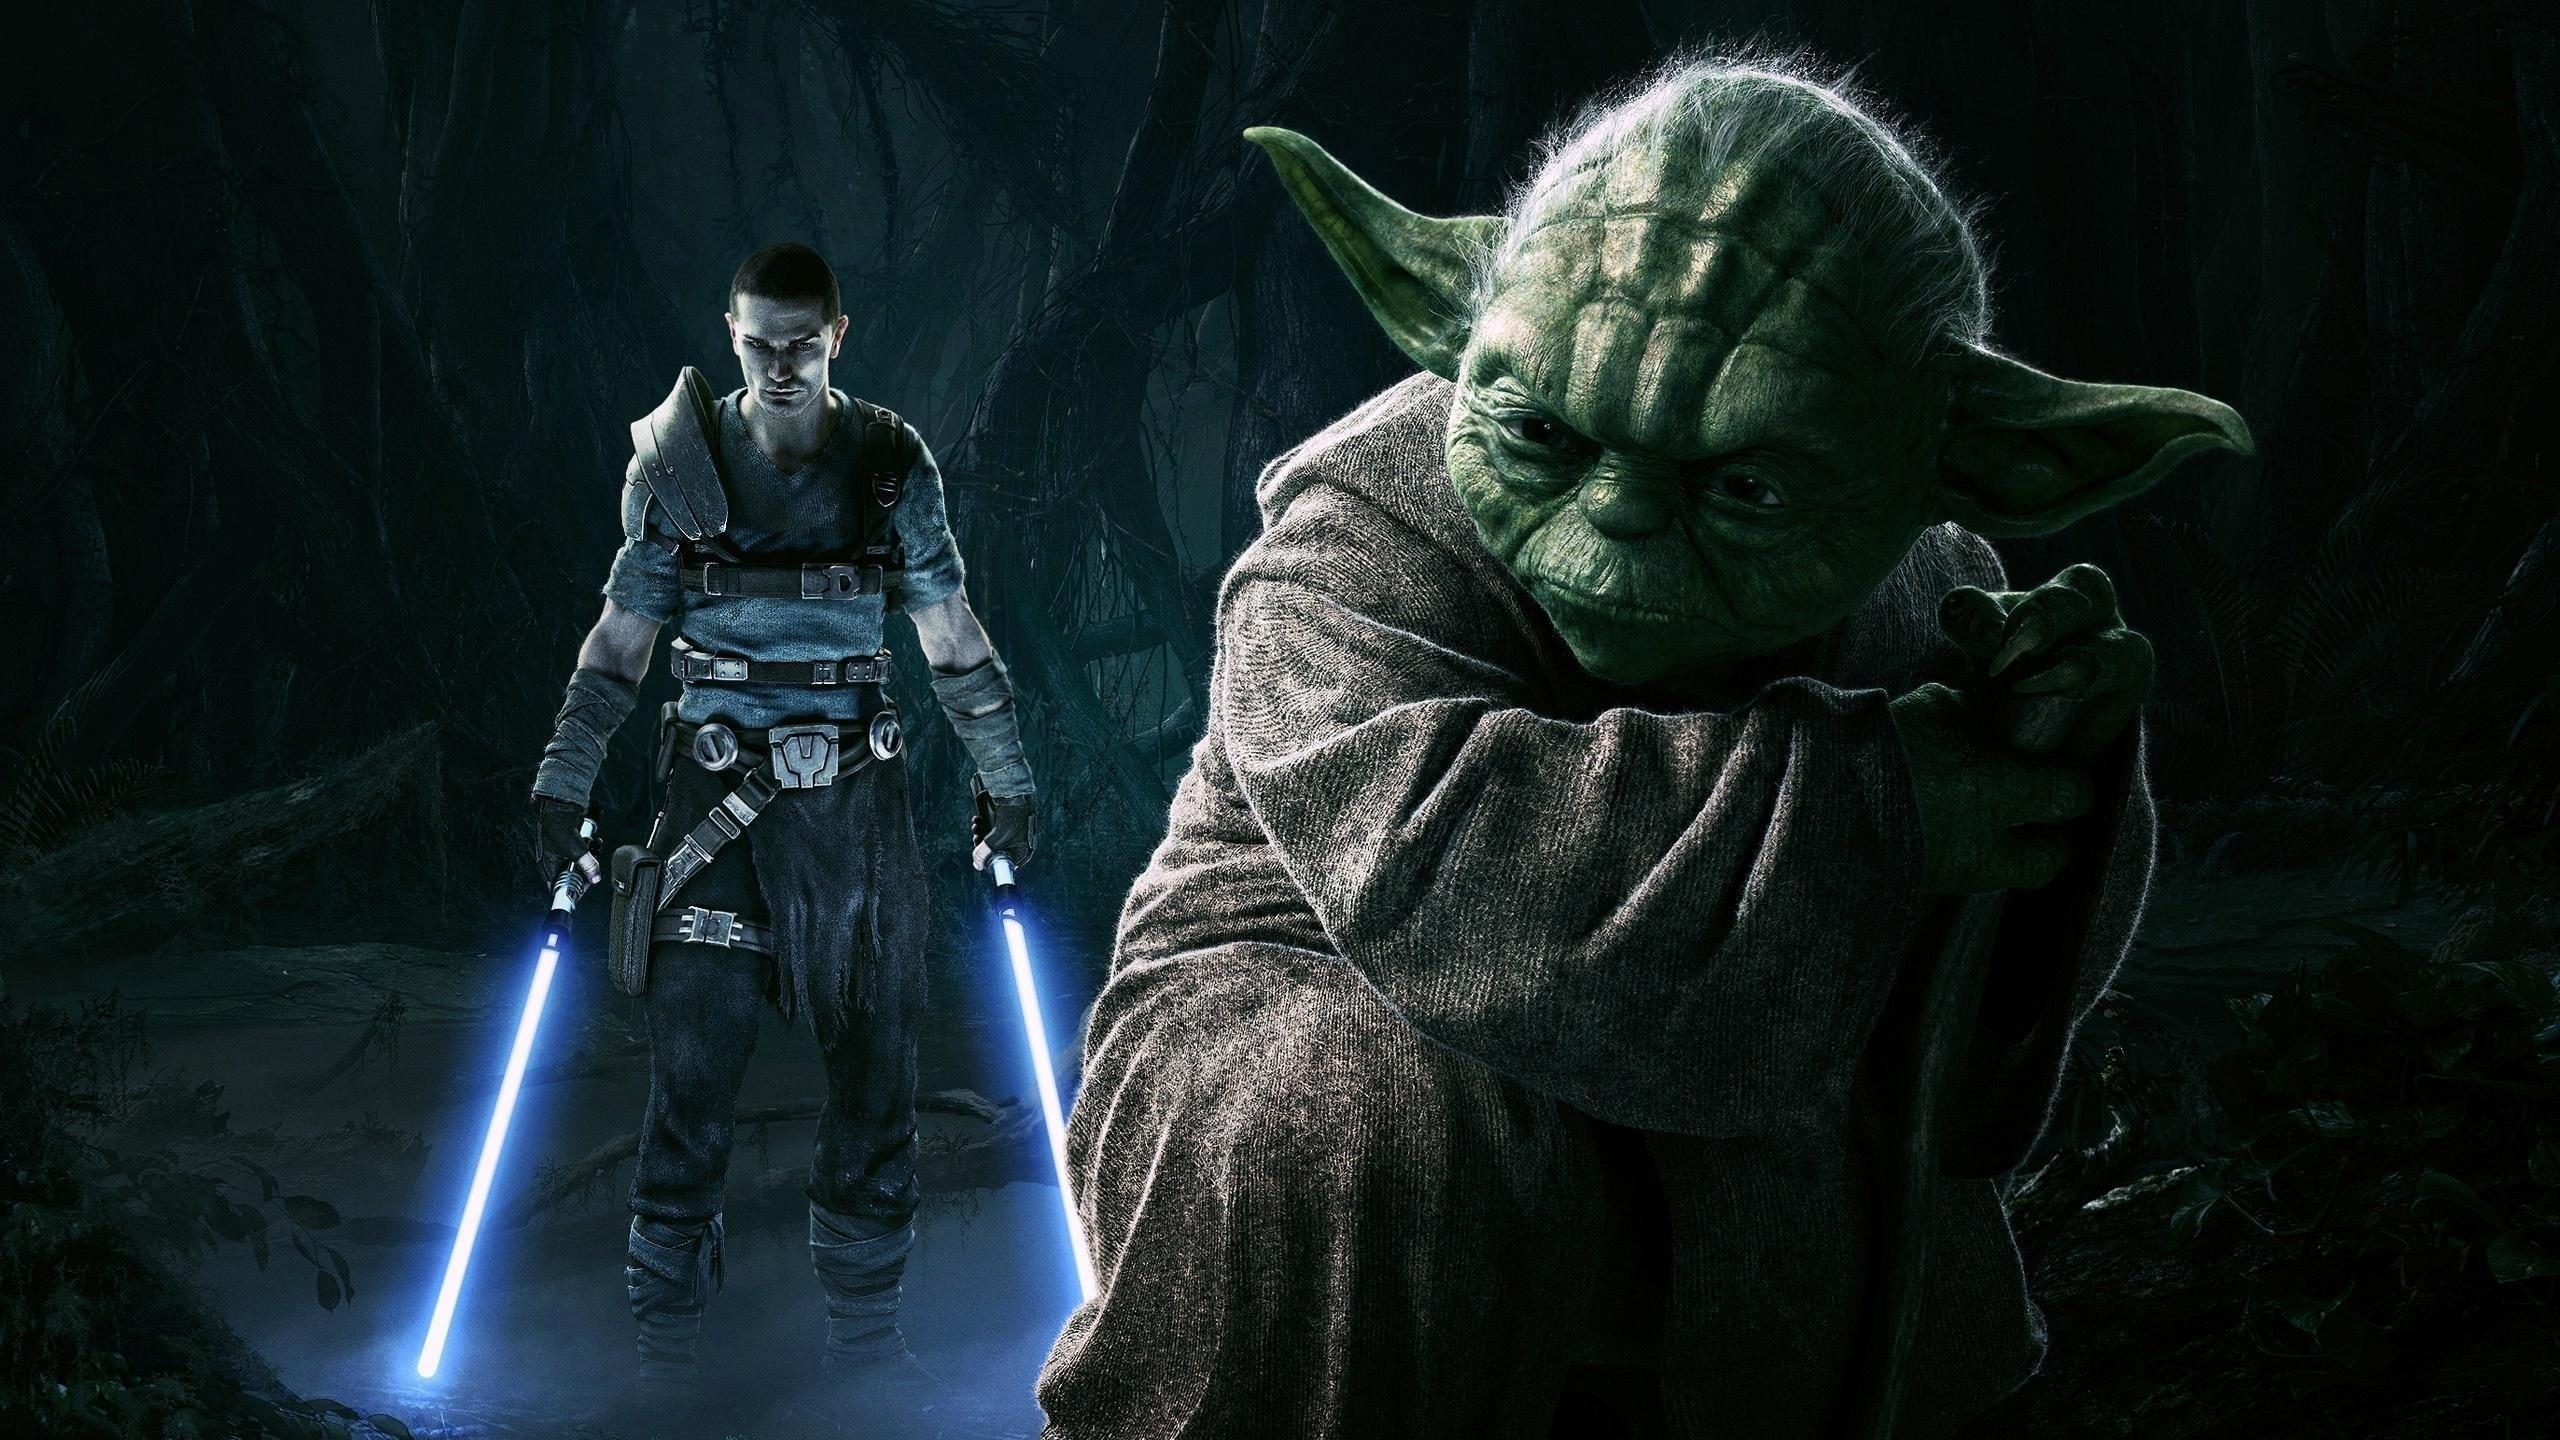 General 2560x1440 Star Wars Star Wars: The Force Unleashed starkiller Yoda Galen Marek